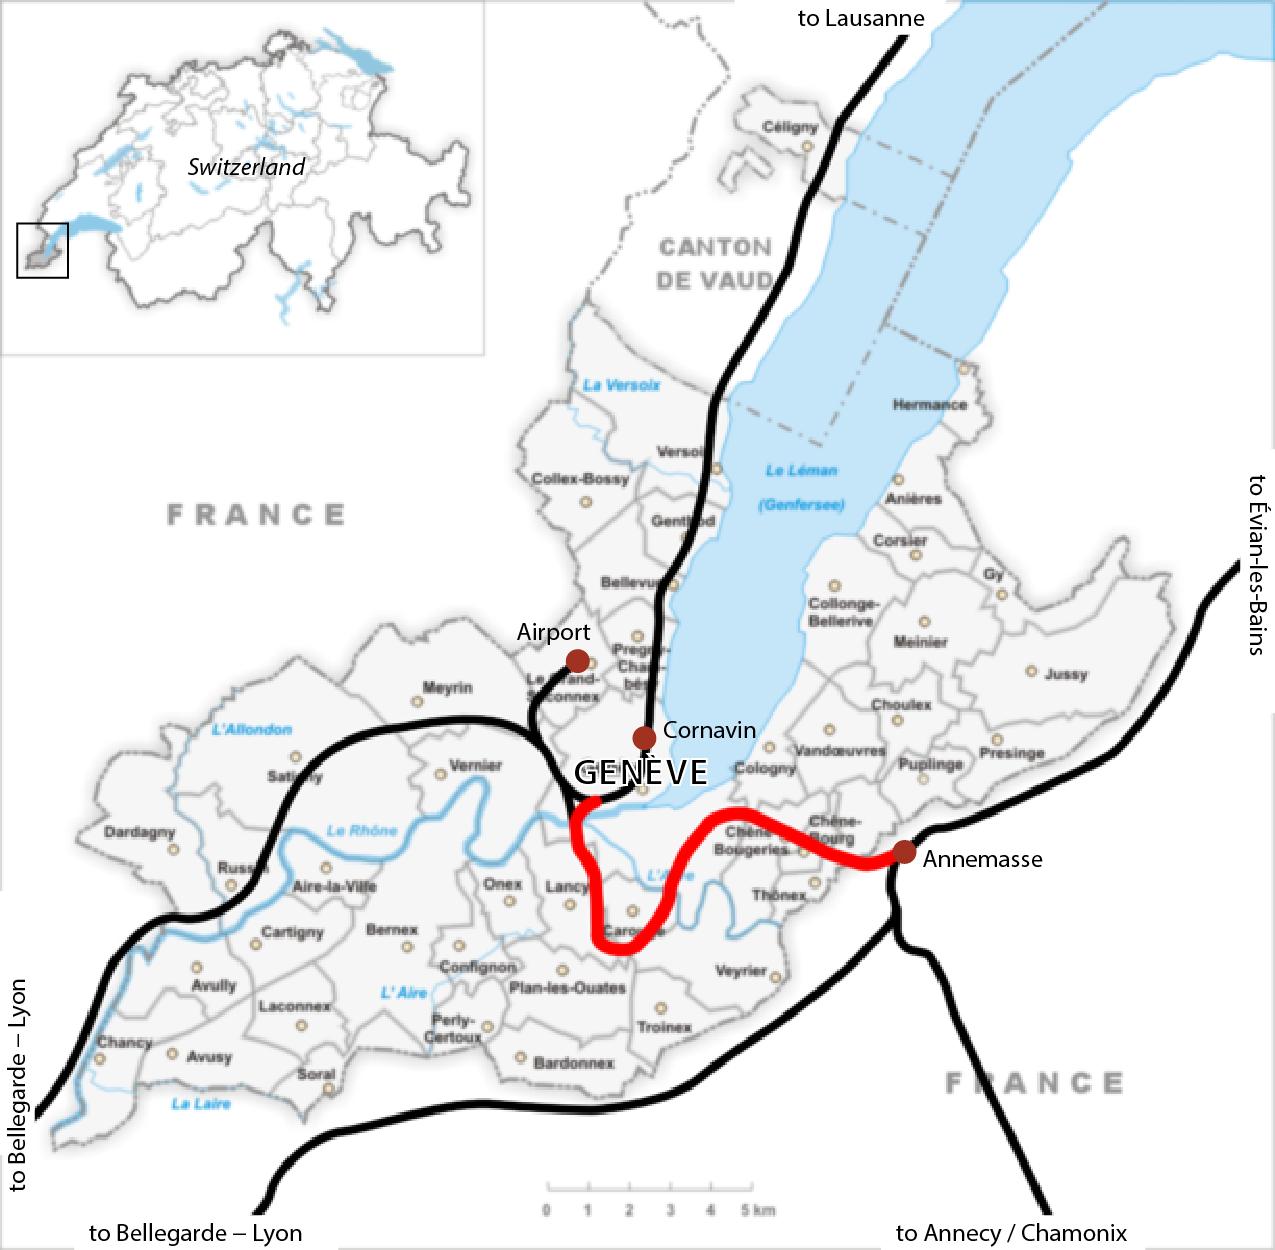 plan genève suisse